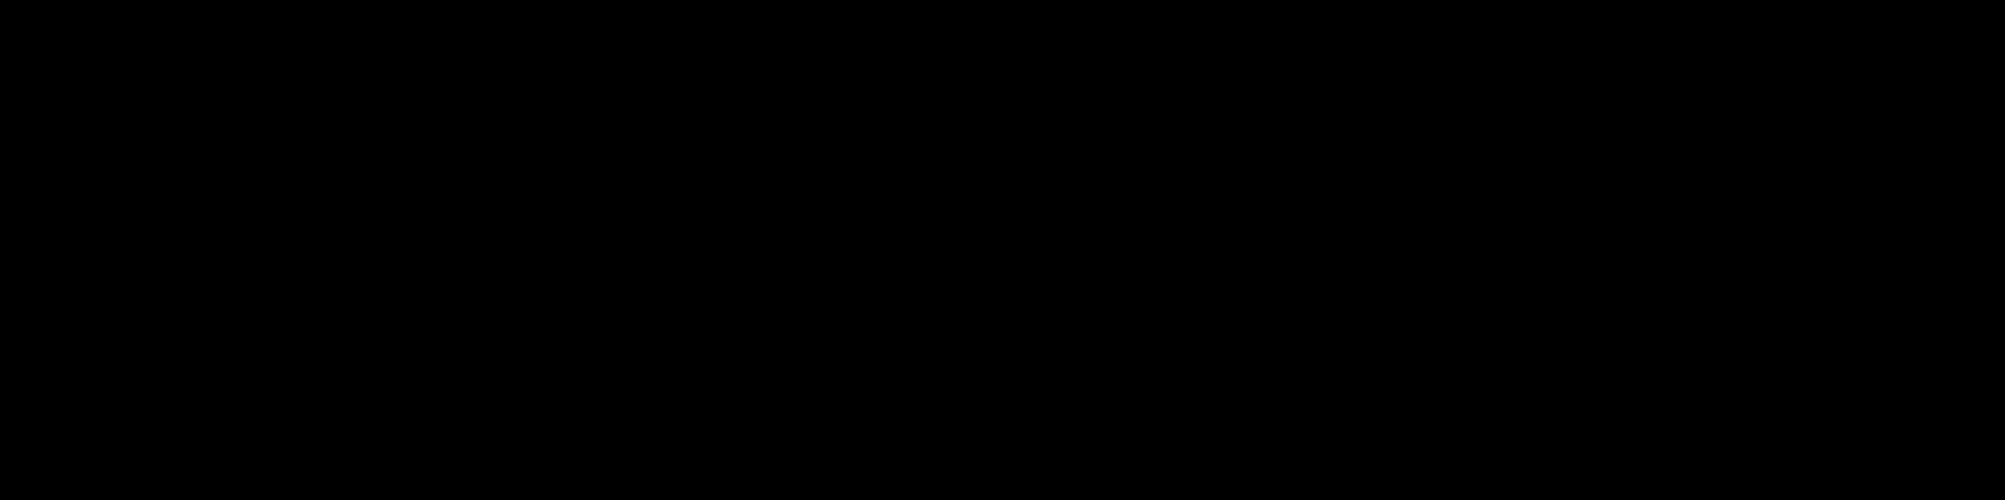 Logo Code Blauw